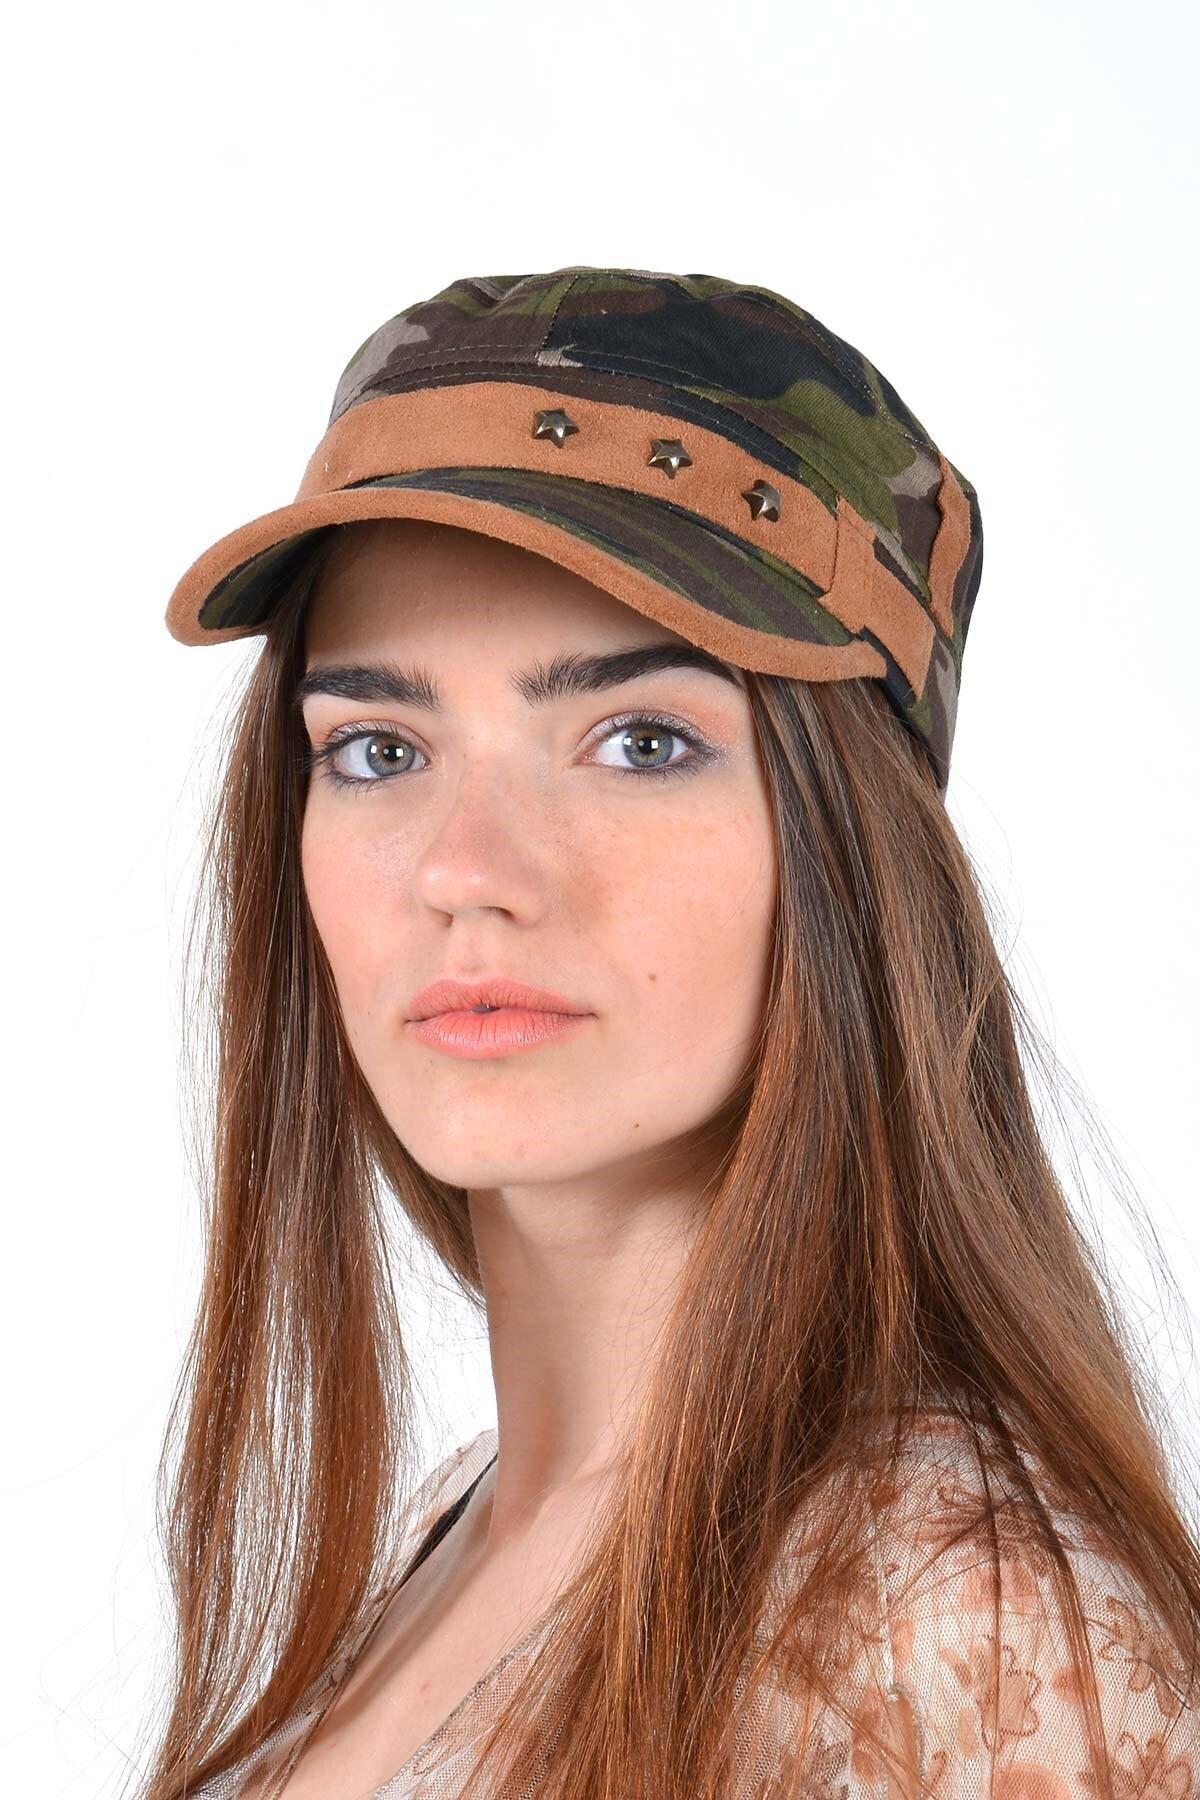 Mossta Unisex Yeşil Kamuflaj Şapka 1